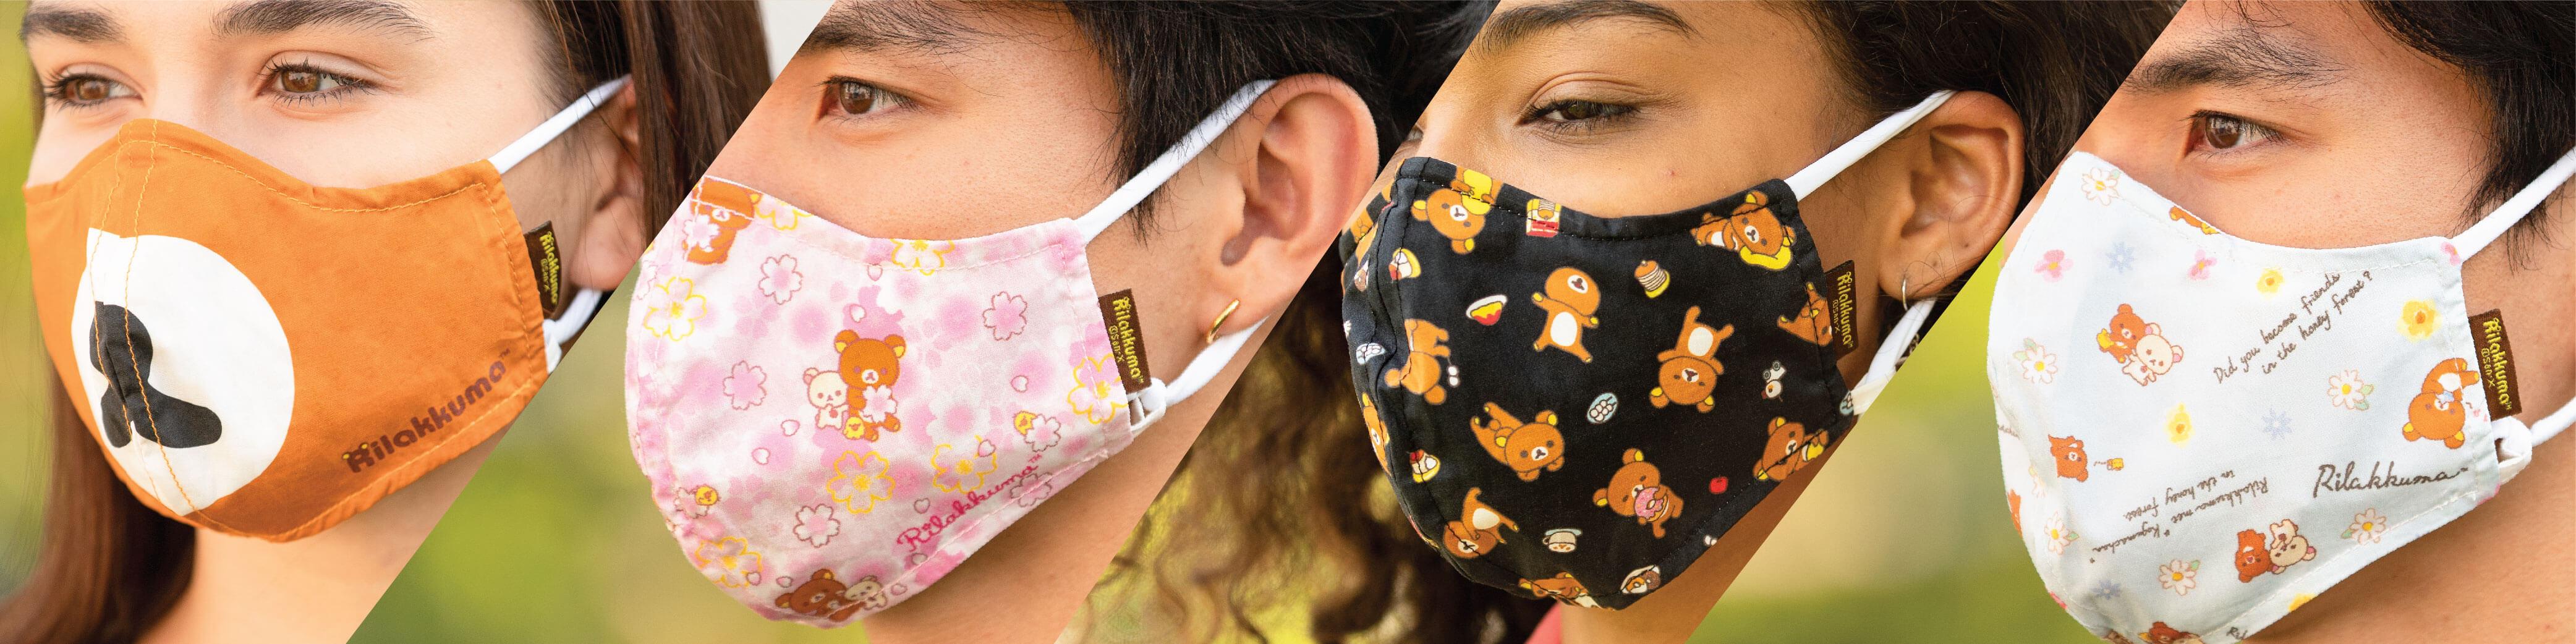 rilakkuma-fae-mask-banner.jpg